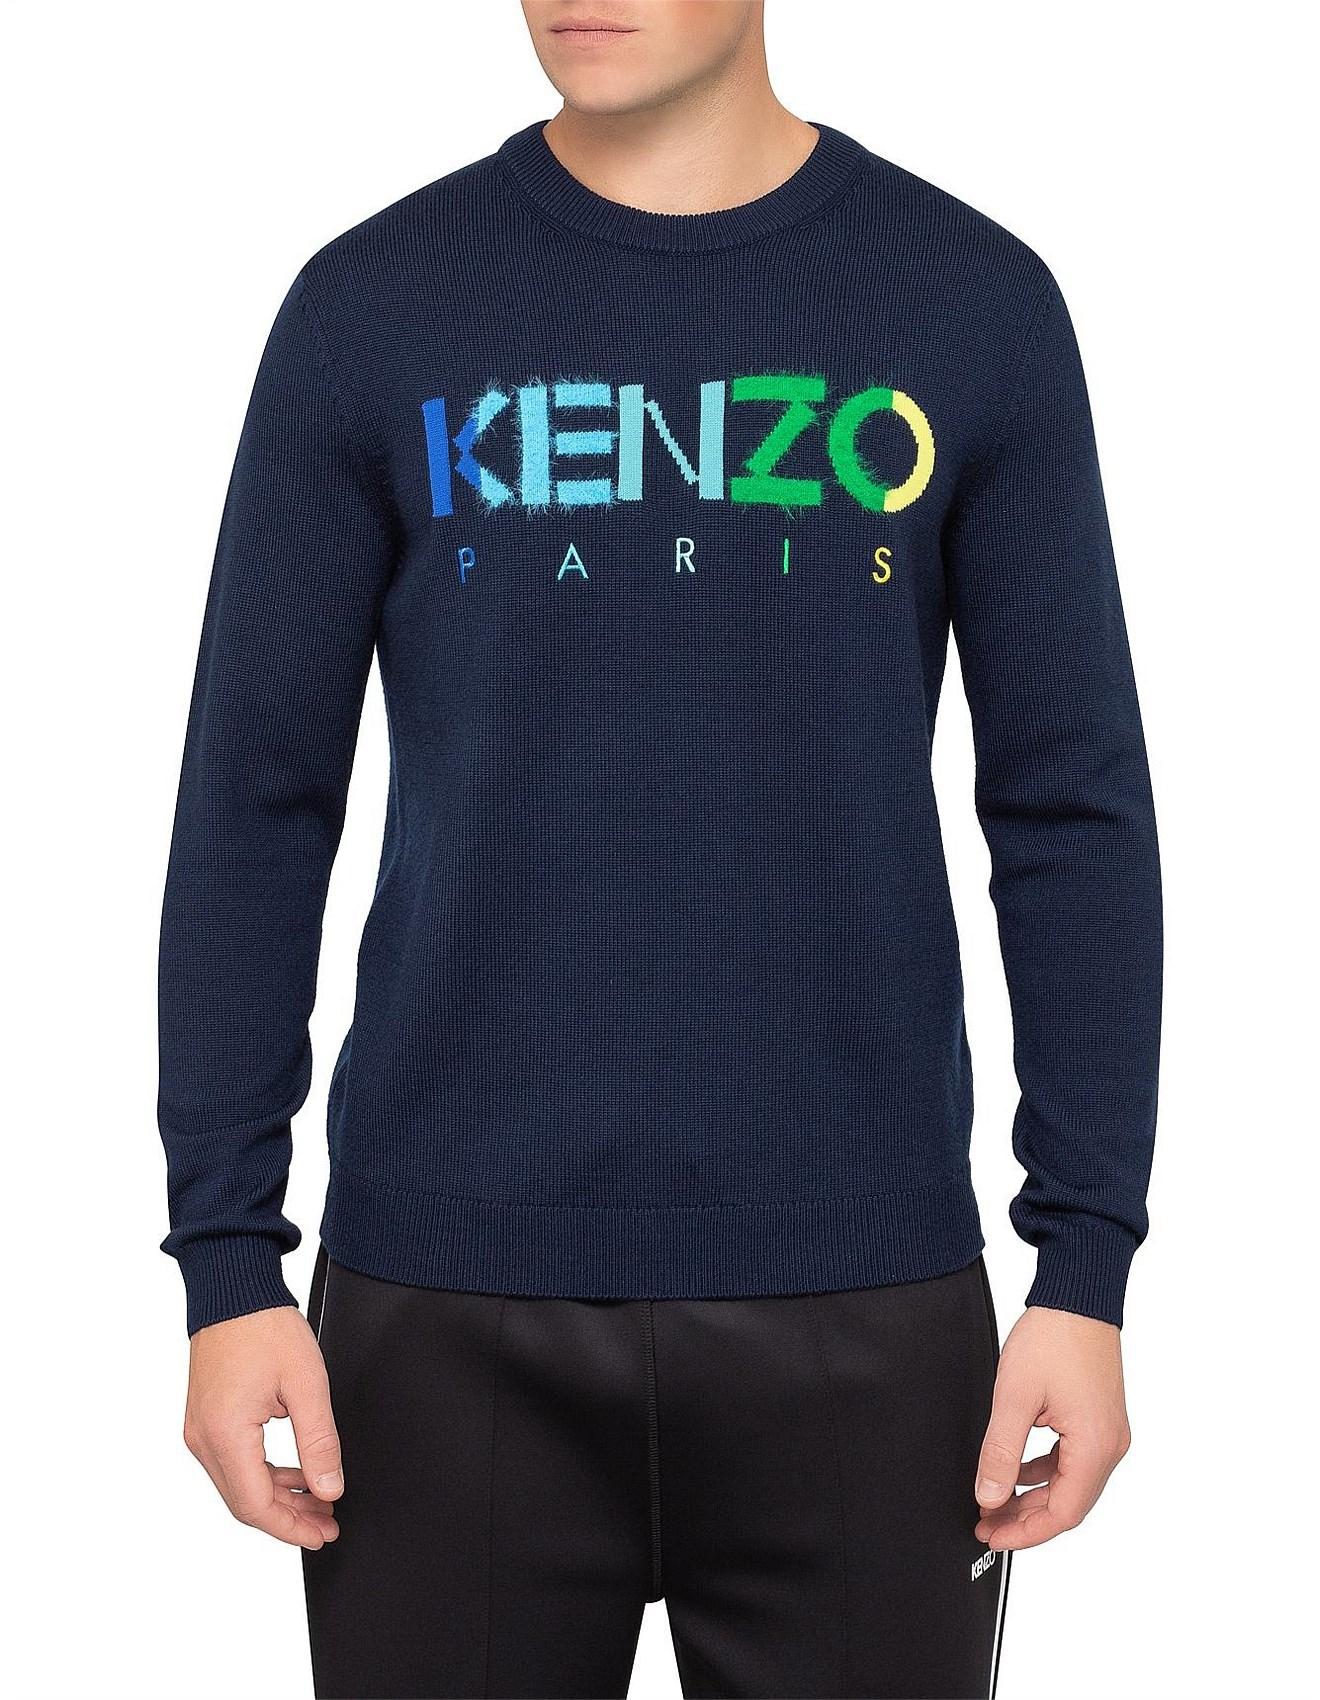 33720162844 Men's Jumpers & Knitwear | Buy Jumpers Online | David Jones - Kenzo ...